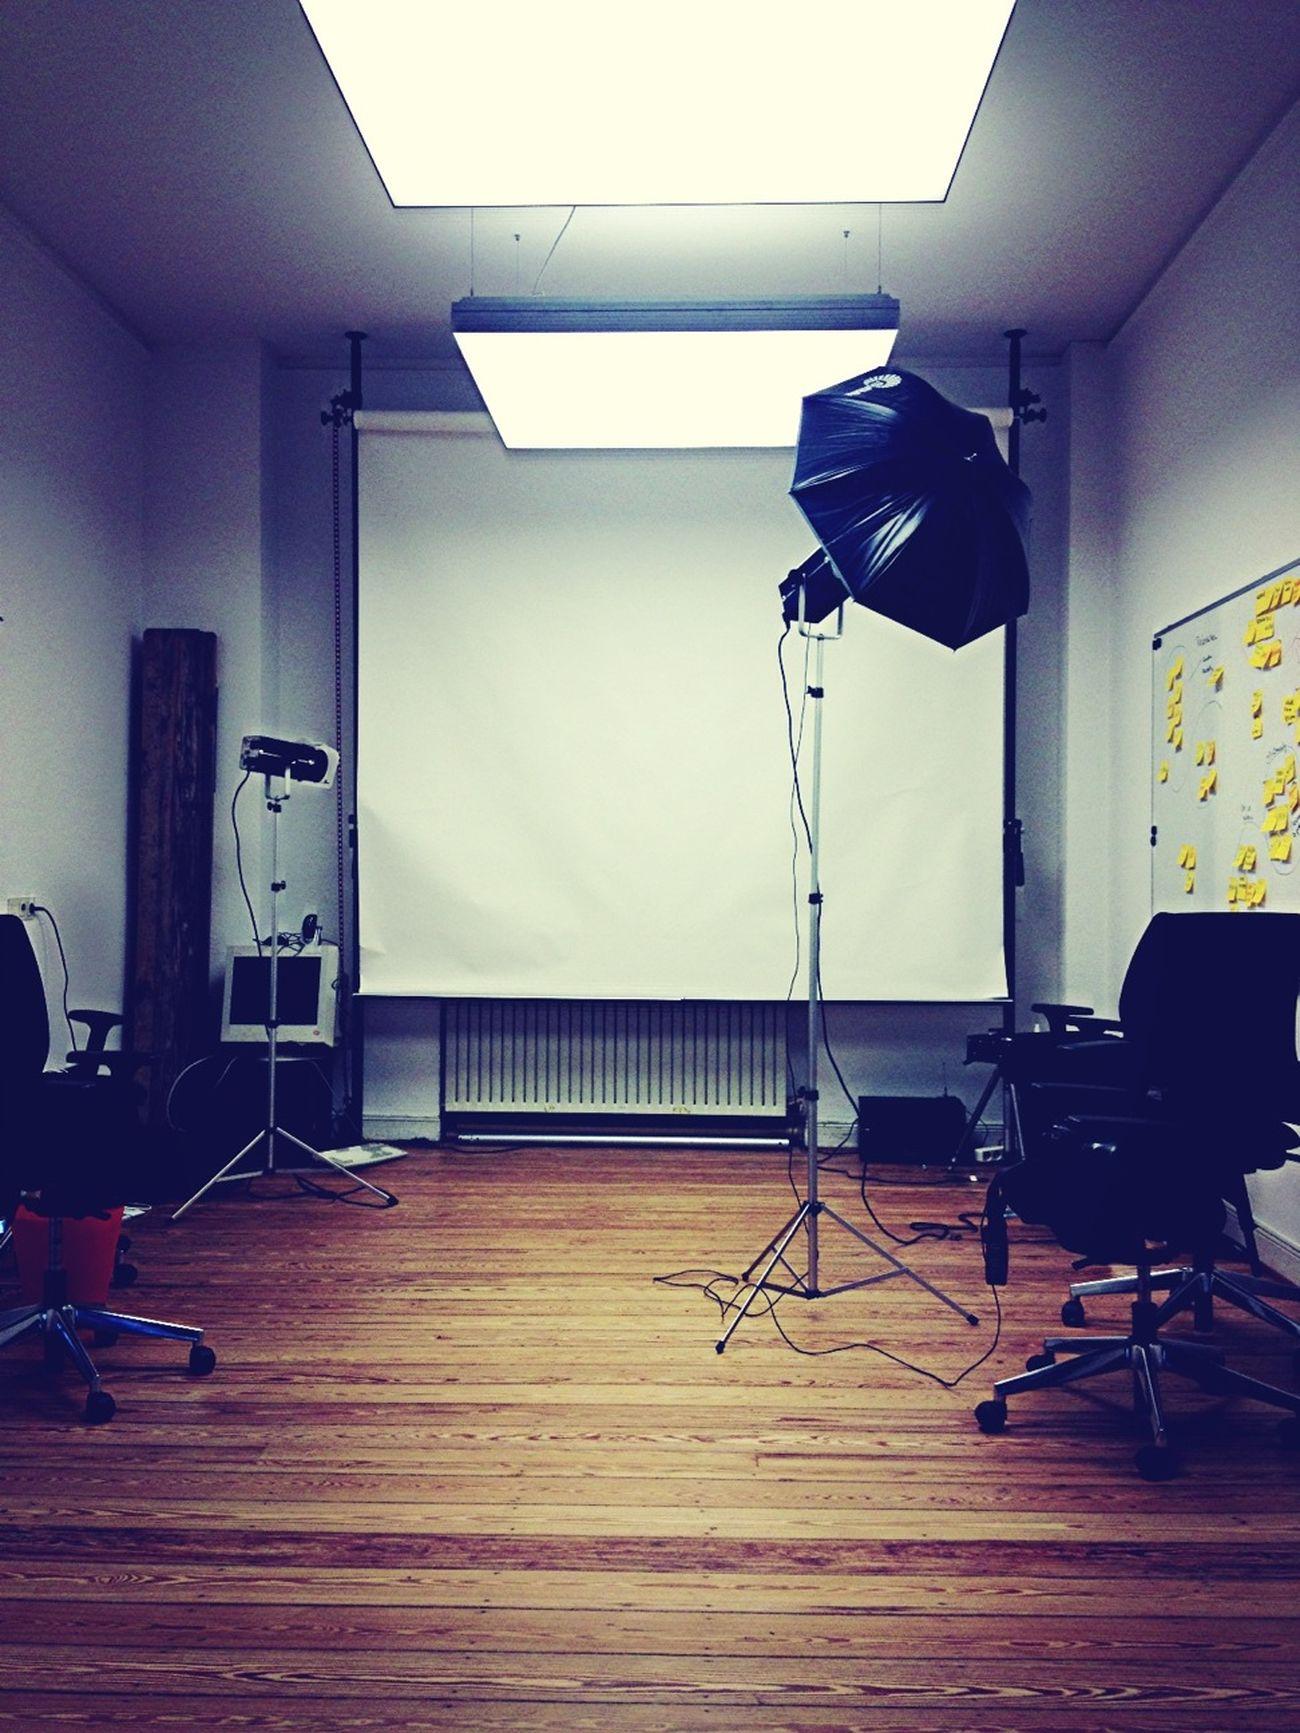 Heute morgen noch Projektmanager, jetzt gleich Fotograf :) love it @webfactory